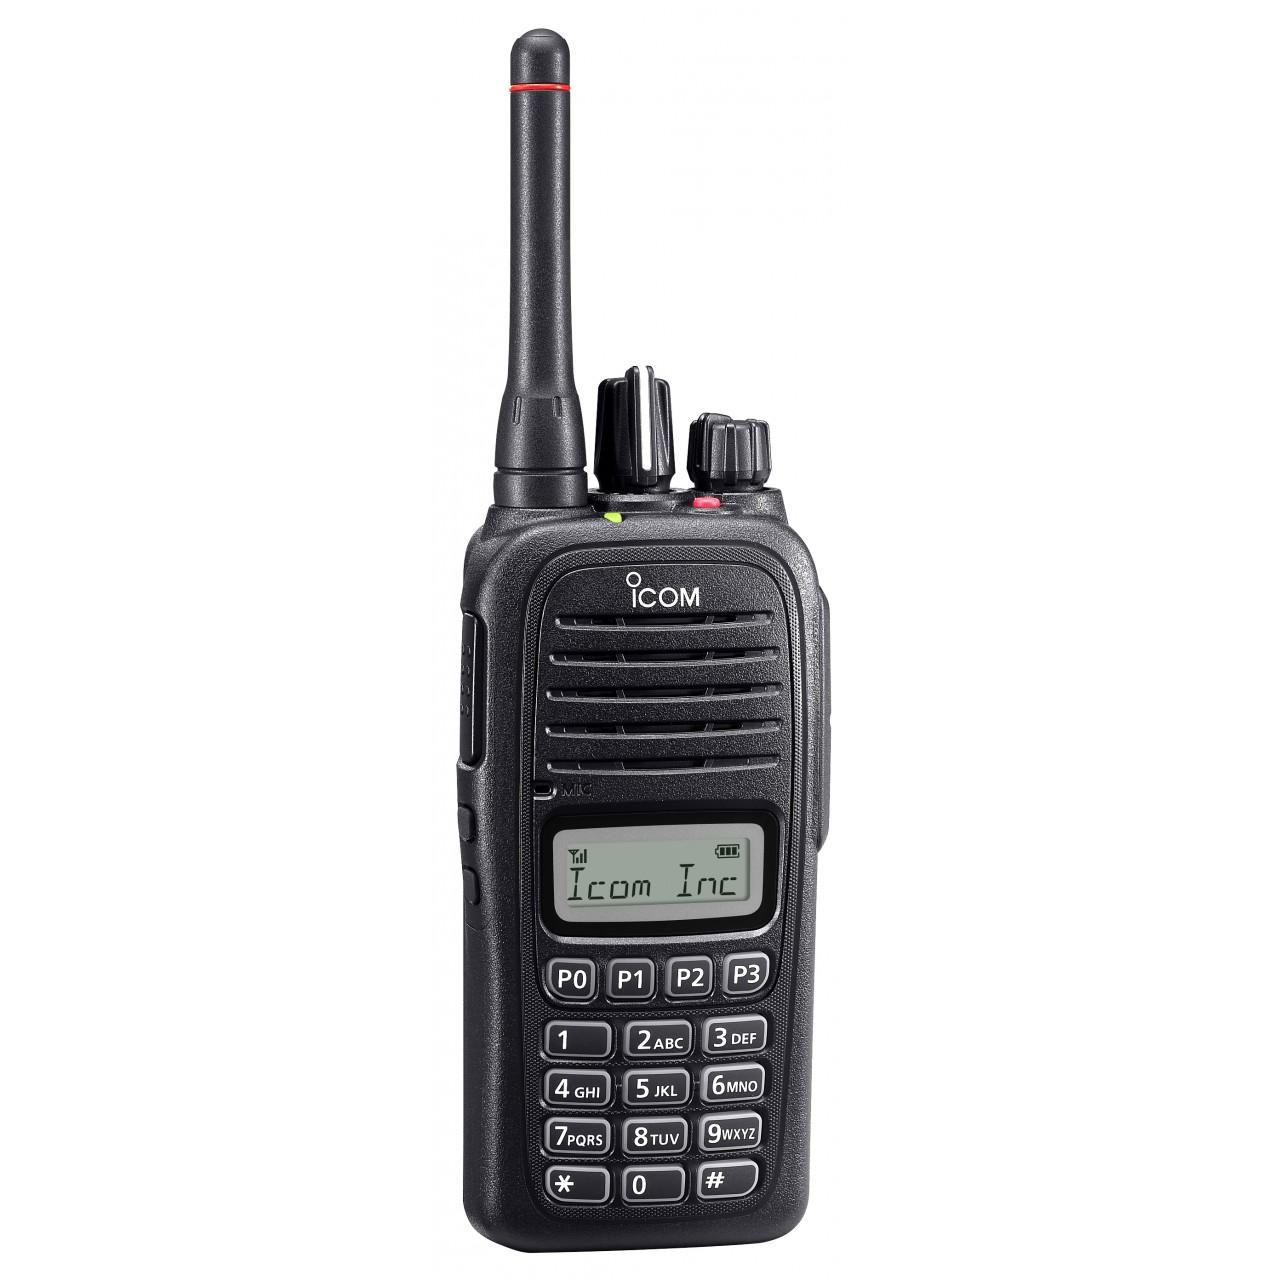 IC-F1100DT / IC-F2100DT avec antenne courte